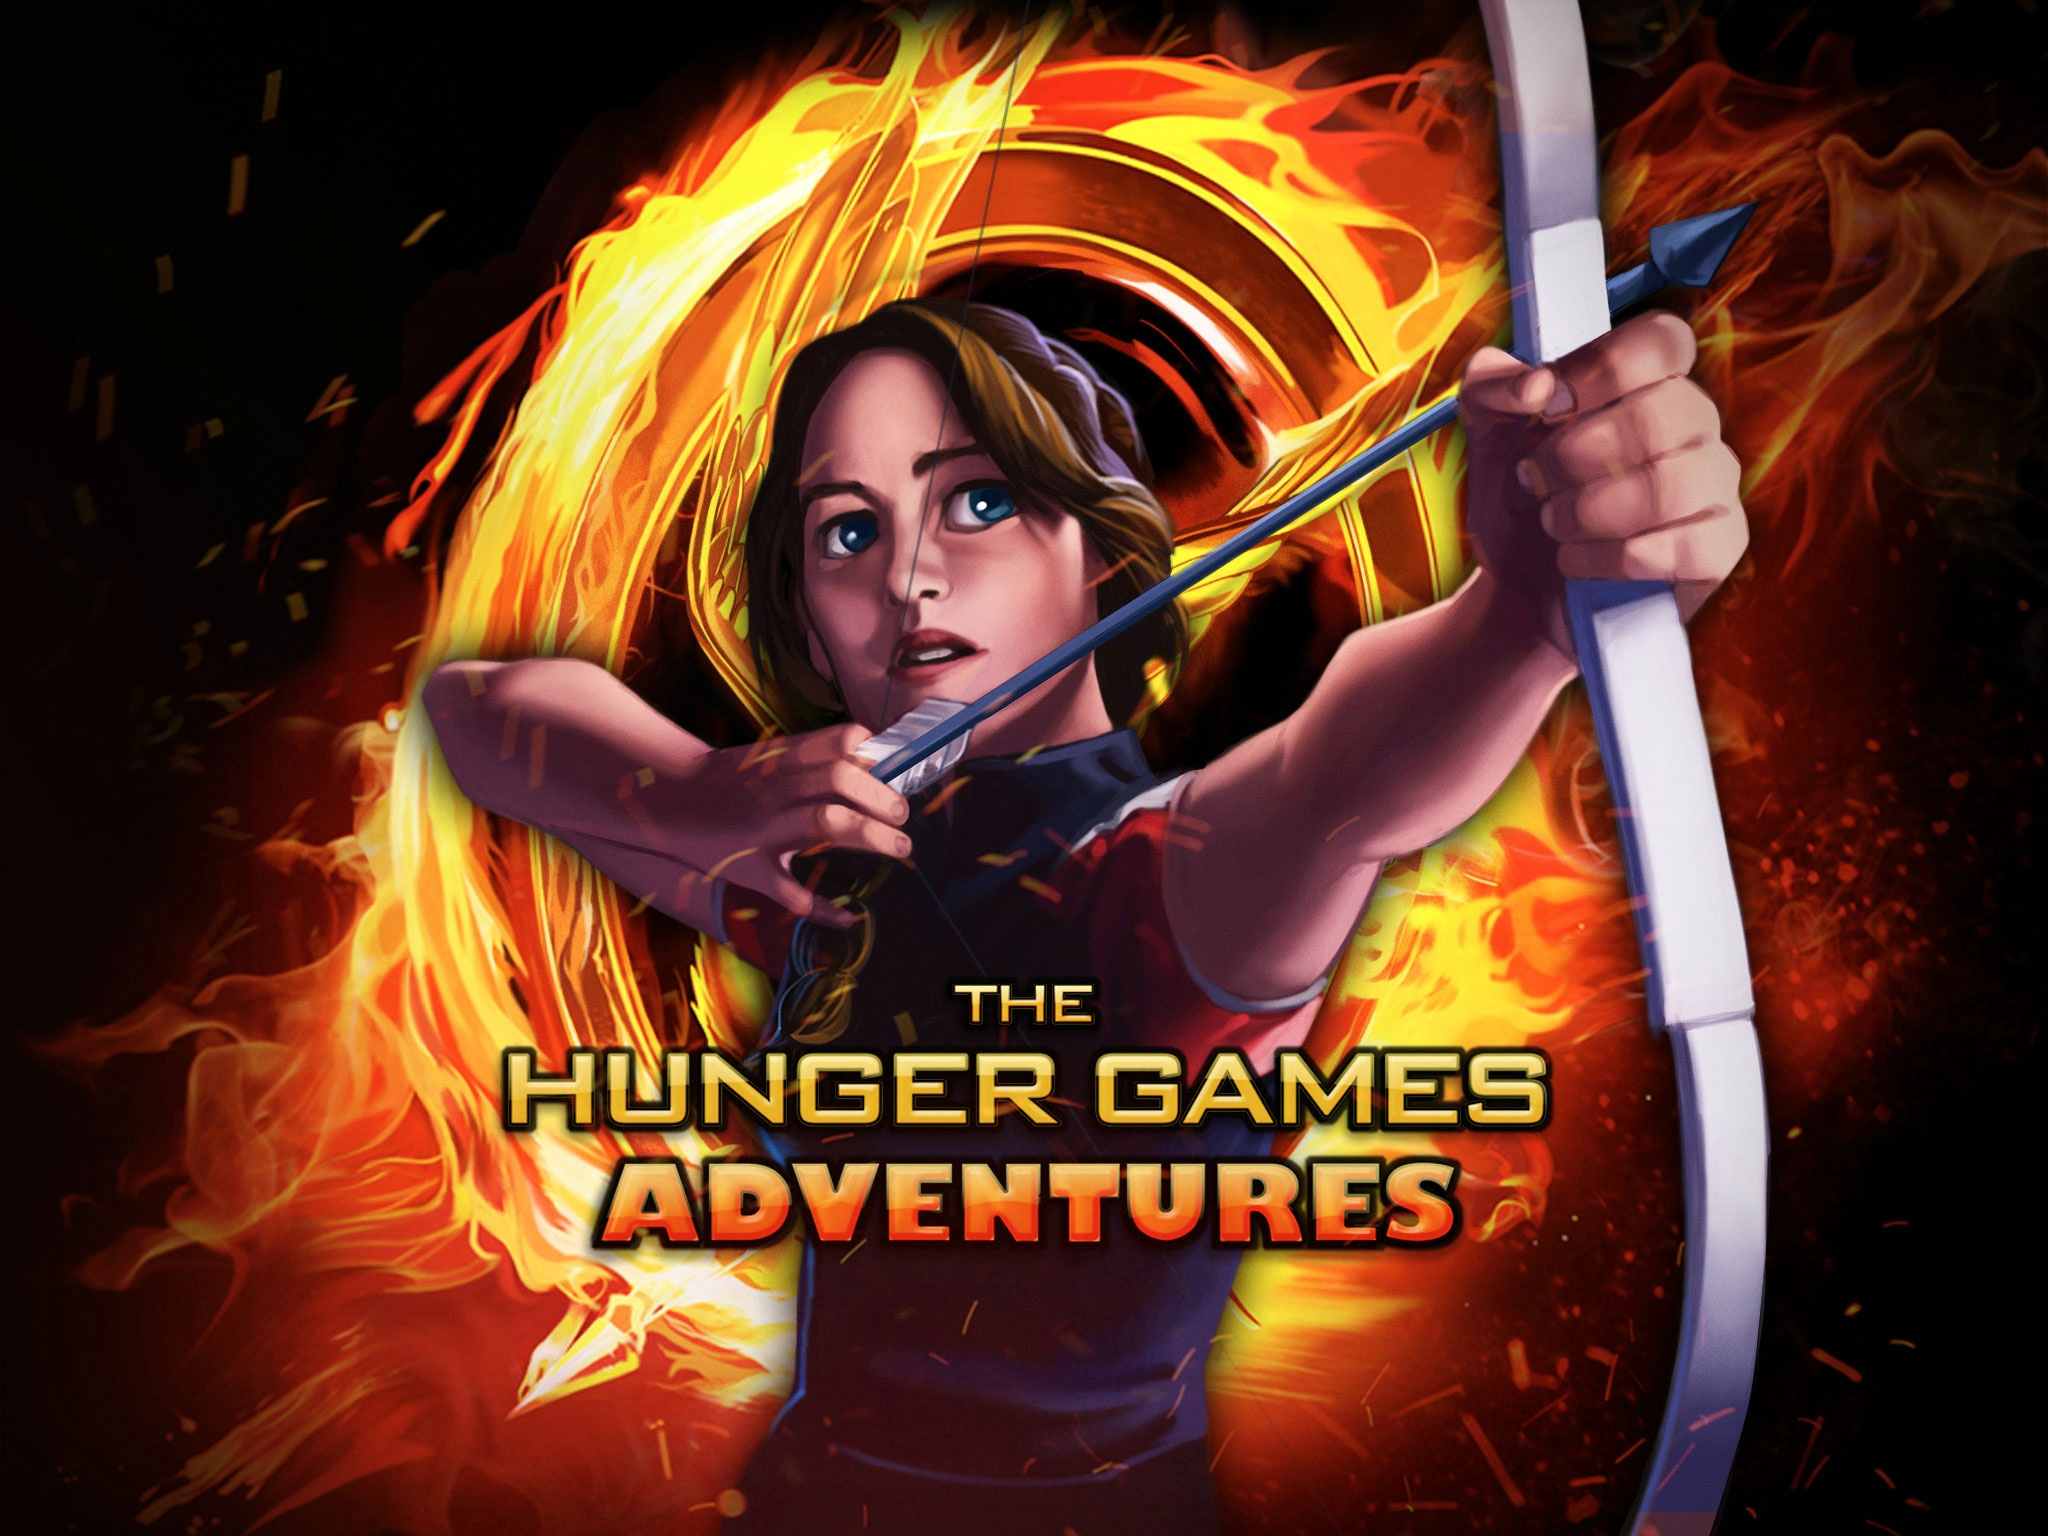 The Hunger Games Games - The Hunger Games